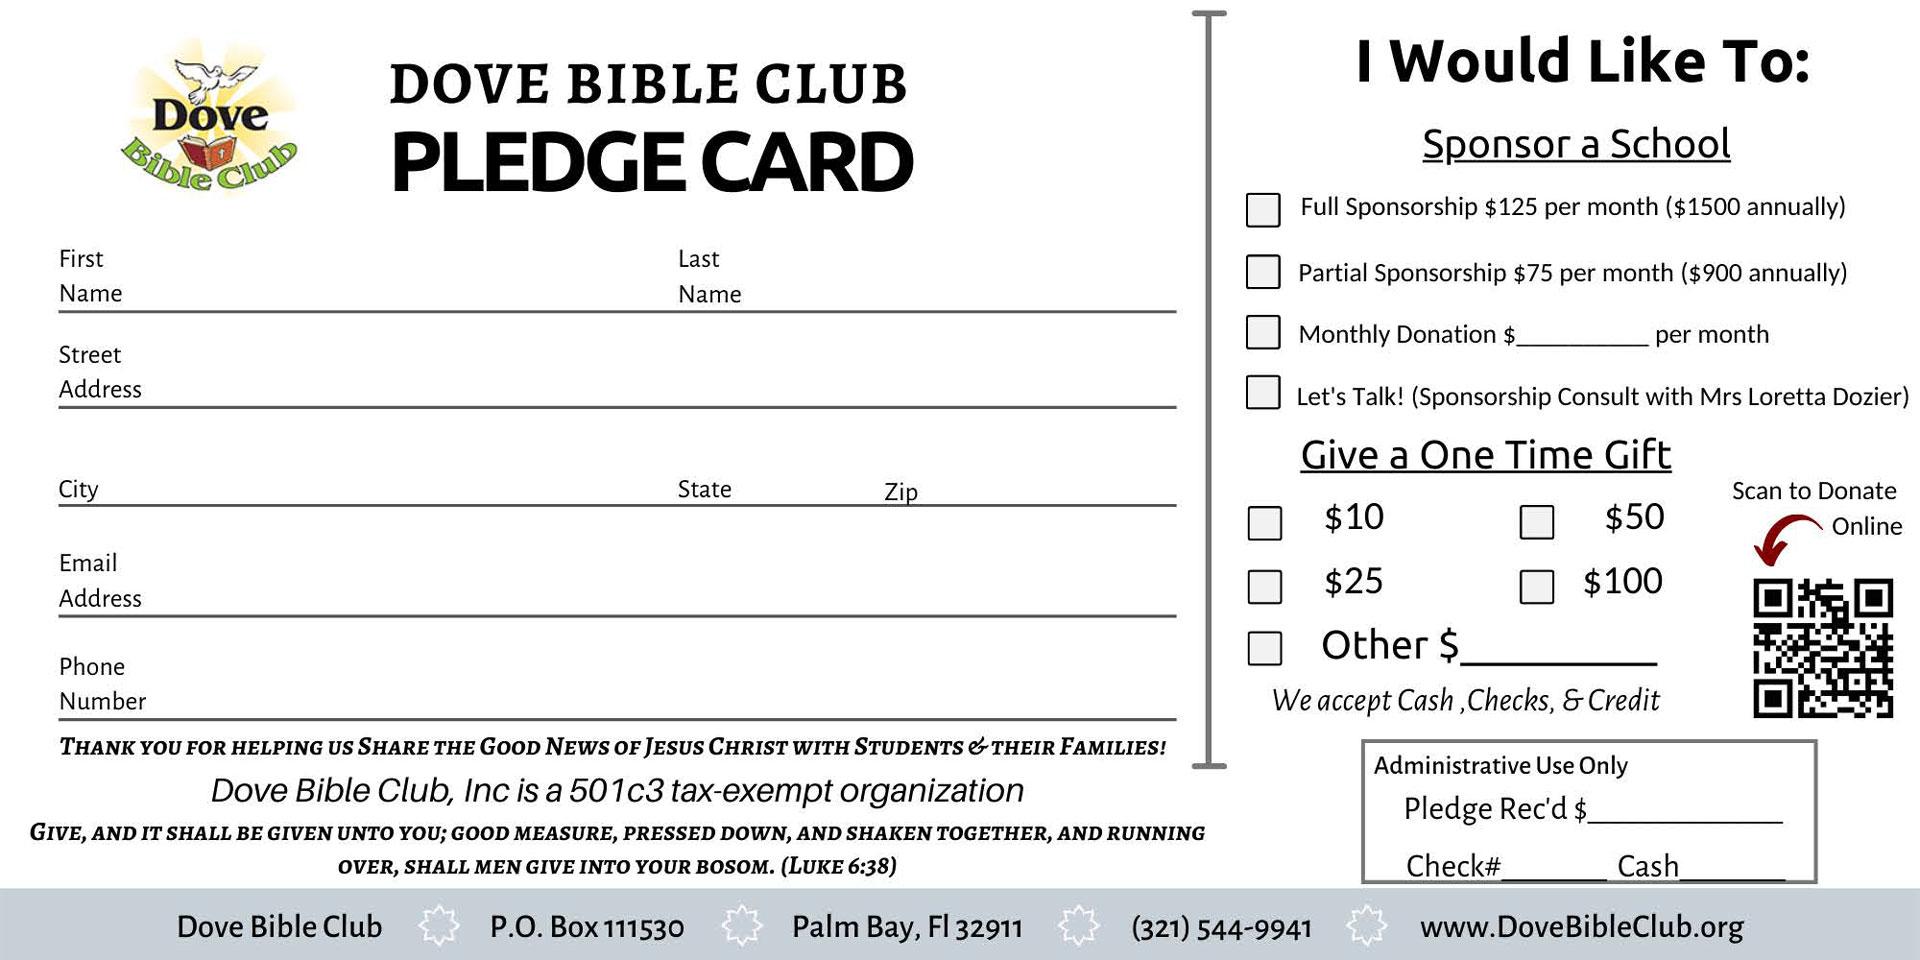 Dove Bible Club Pledge Card